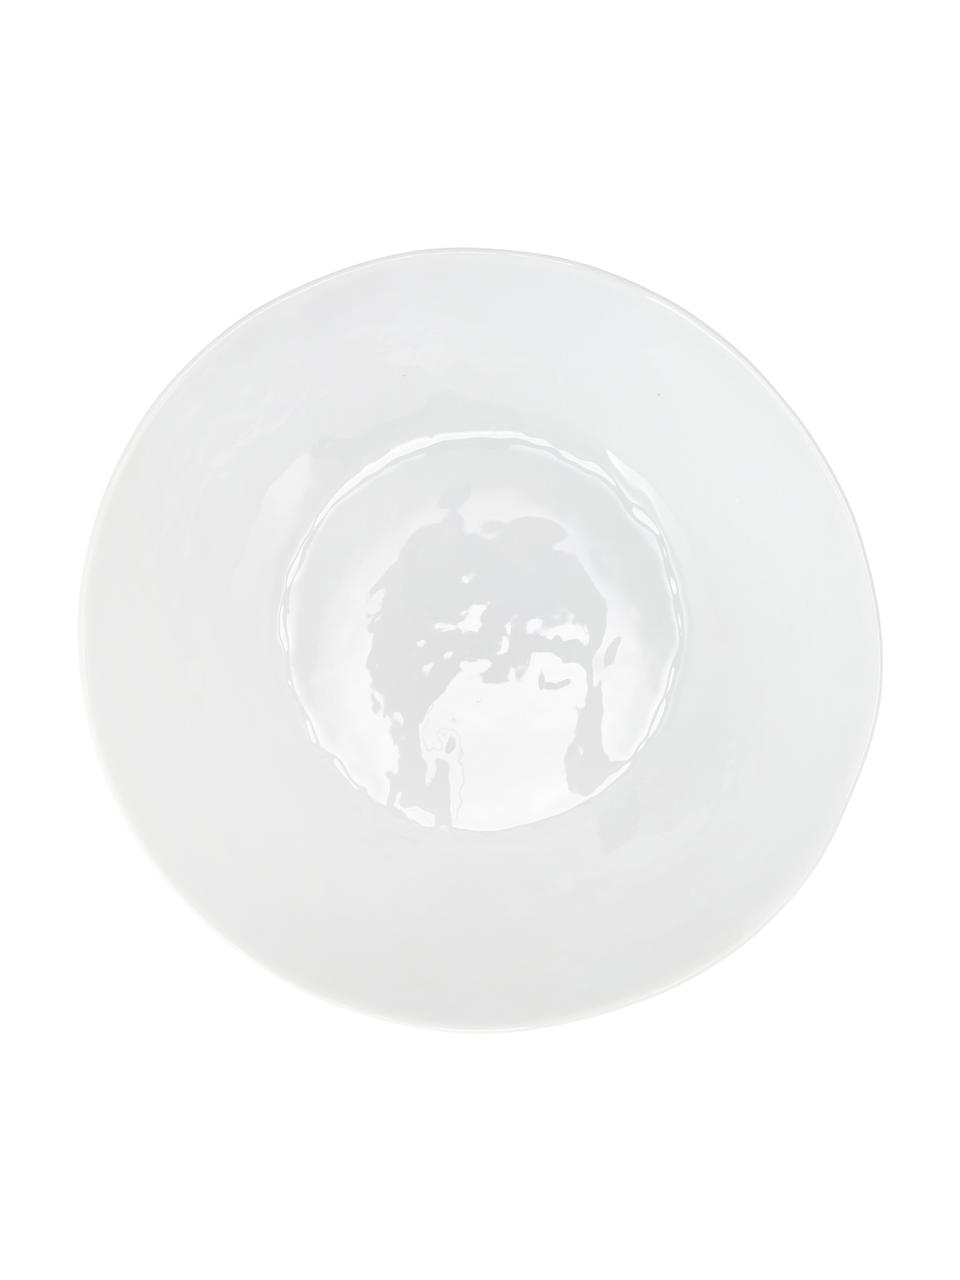 Ciotola centrotavola con superficie irregolare Porcelino, Porcellana, volutamente irregolare, Bianco, Larg. 33 x Prof. 37 cm